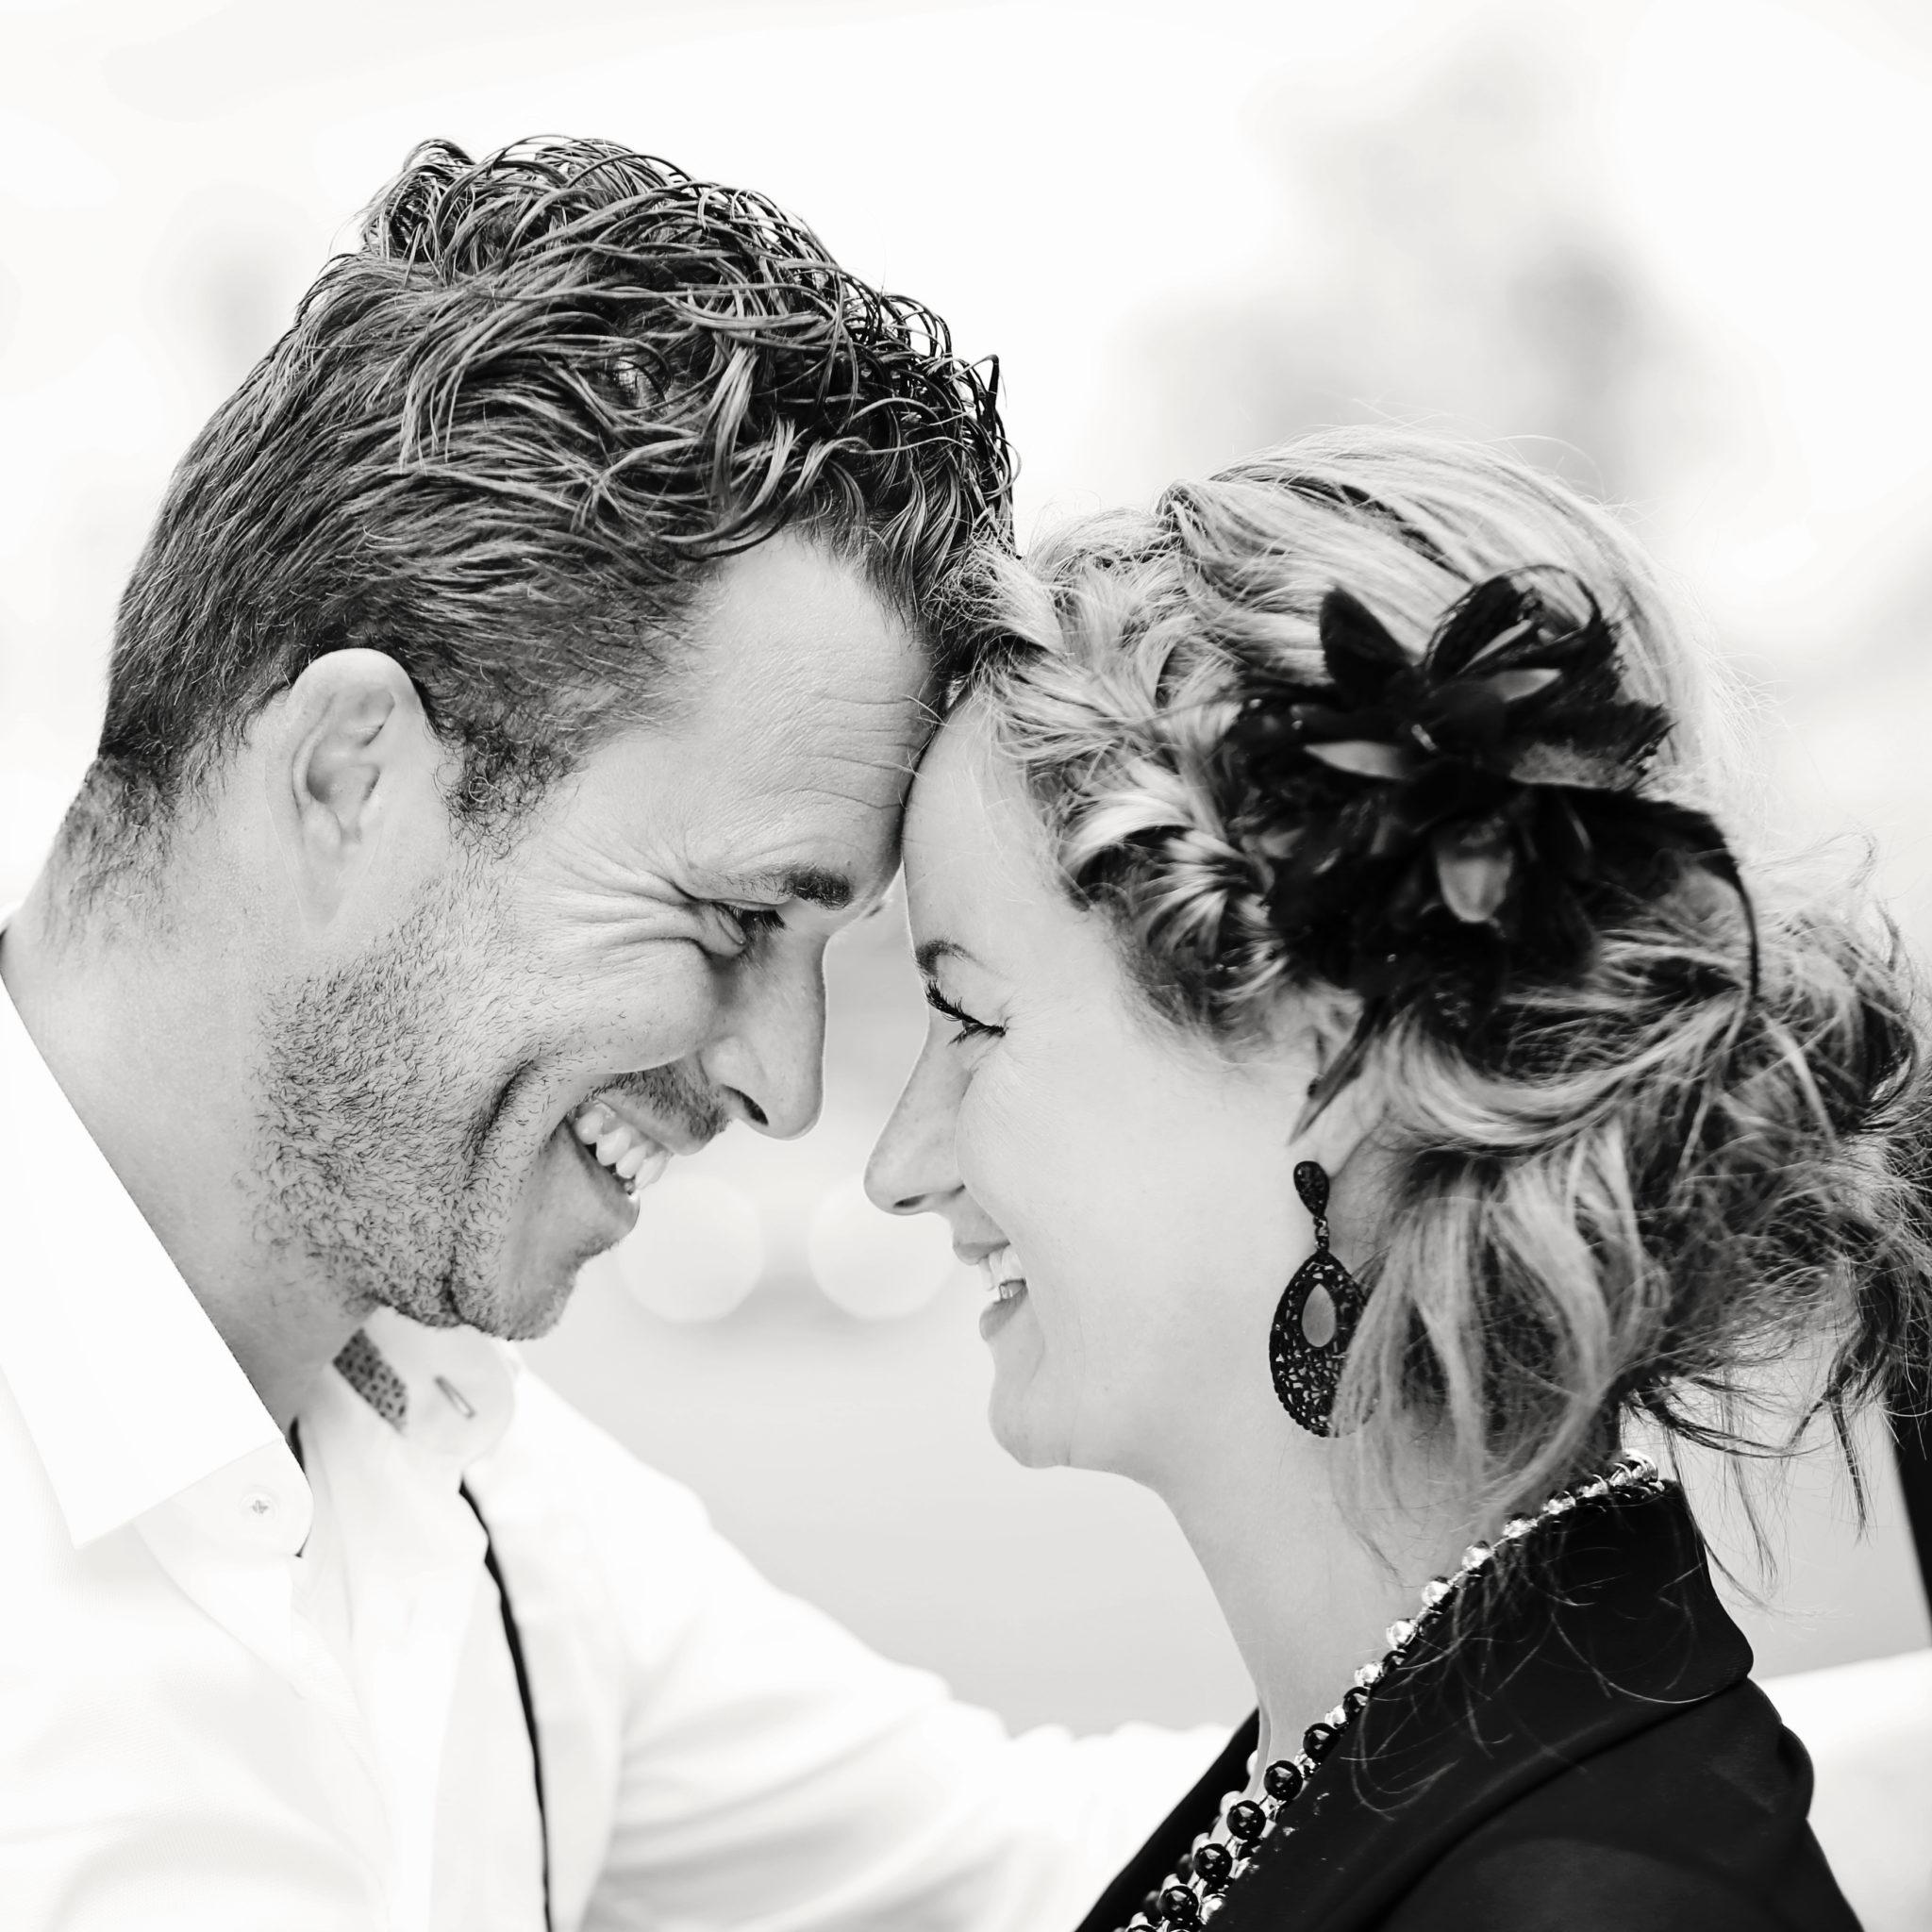 Loveshoot-Suus' FotoSjop